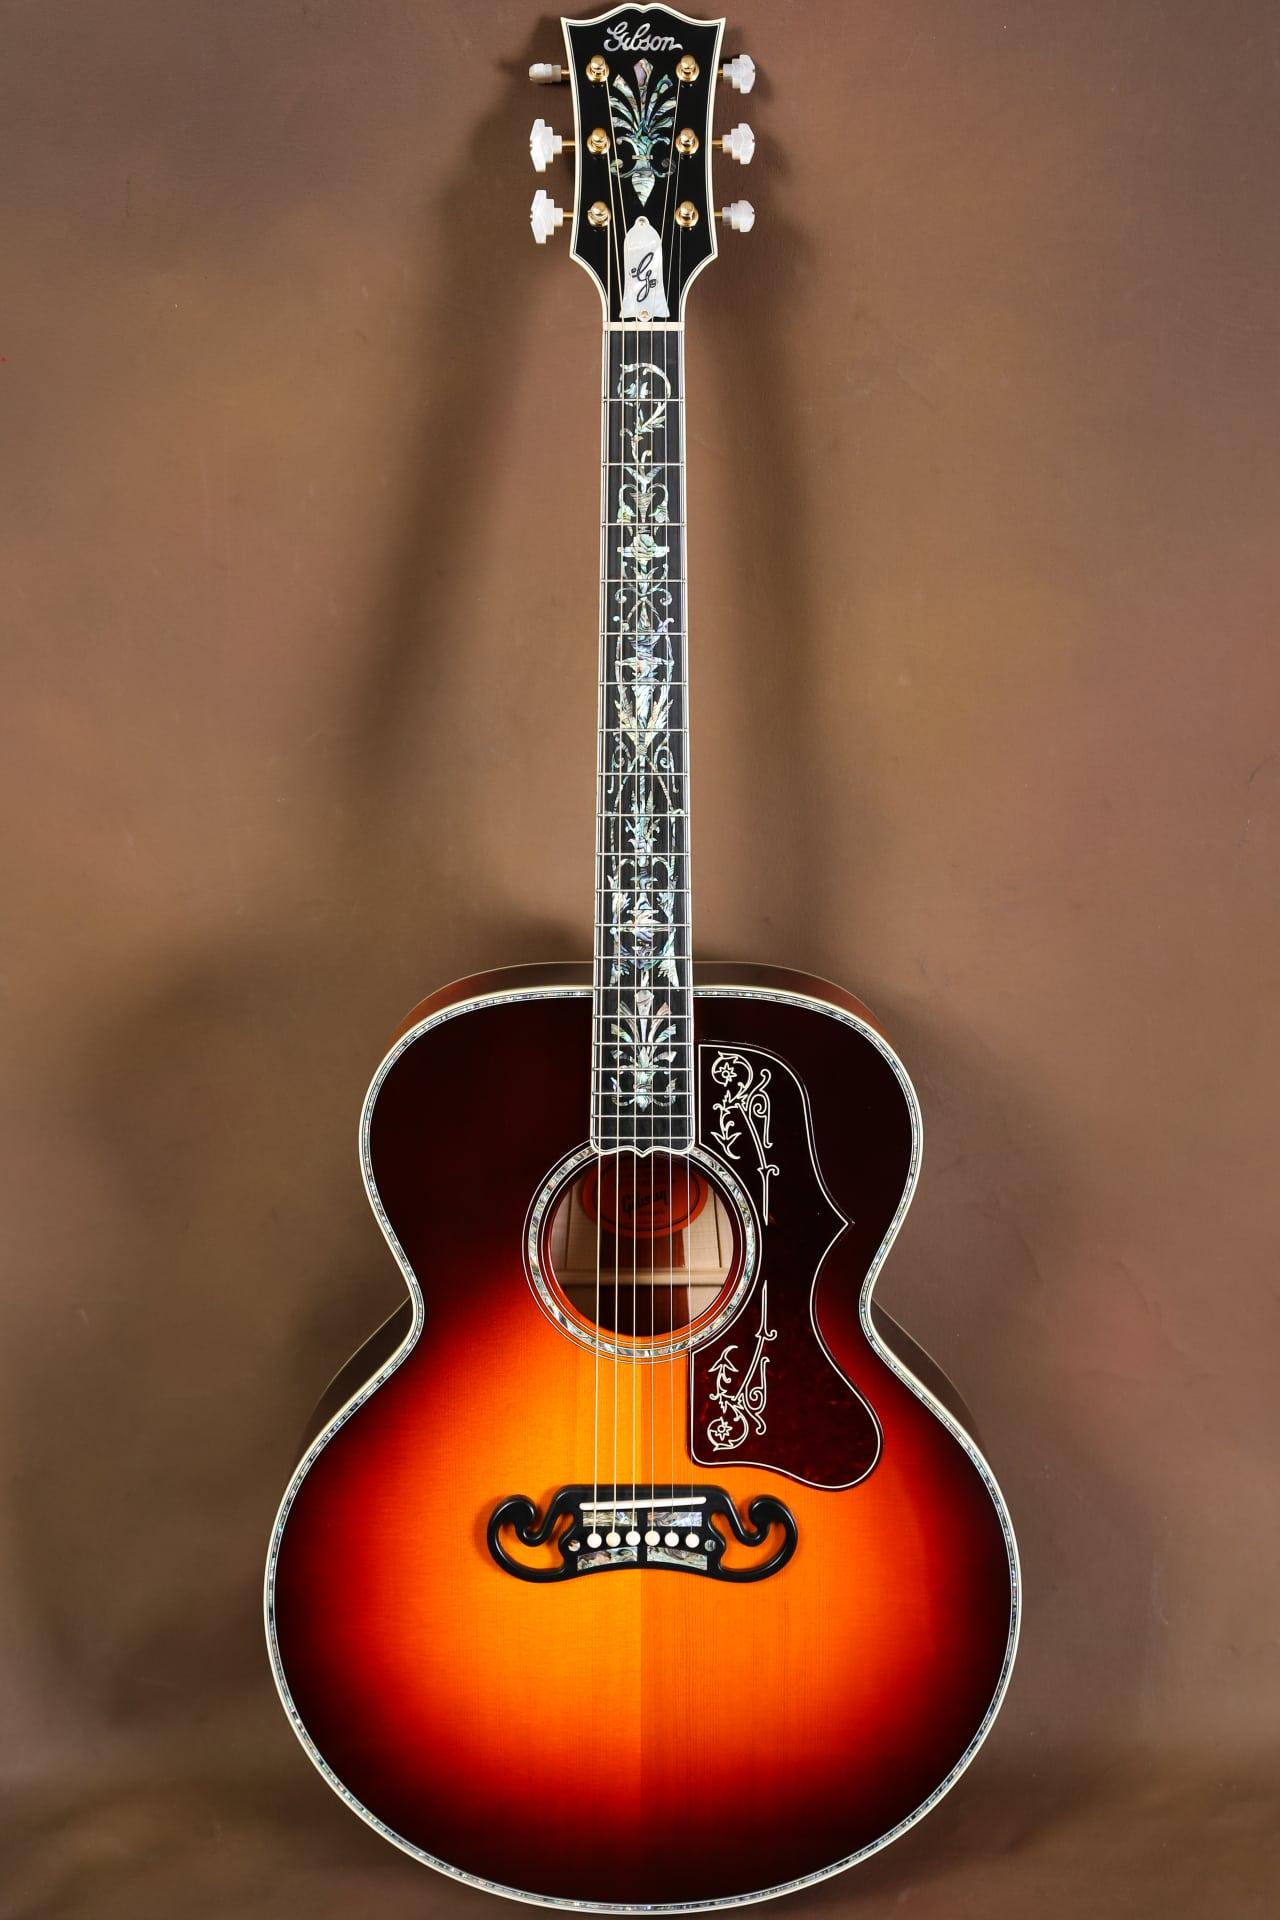 2016 gibson sj 200 gallery custom vine acoustic guitar j 200 reverb. Black Bedroom Furniture Sets. Home Design Ideas